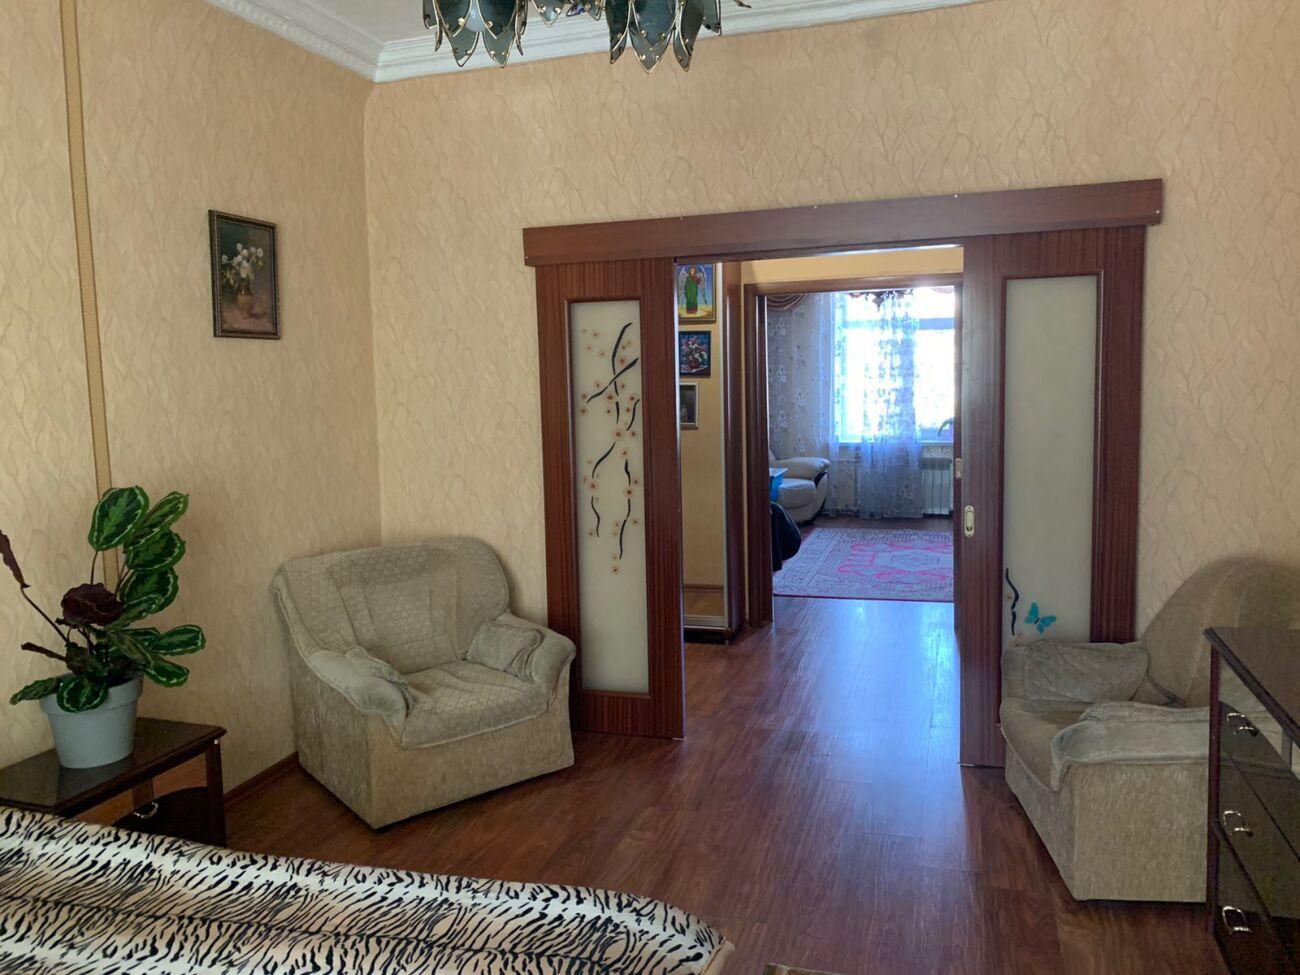 Аренда Днепр. 4к квартира на ул. Гоголя 1